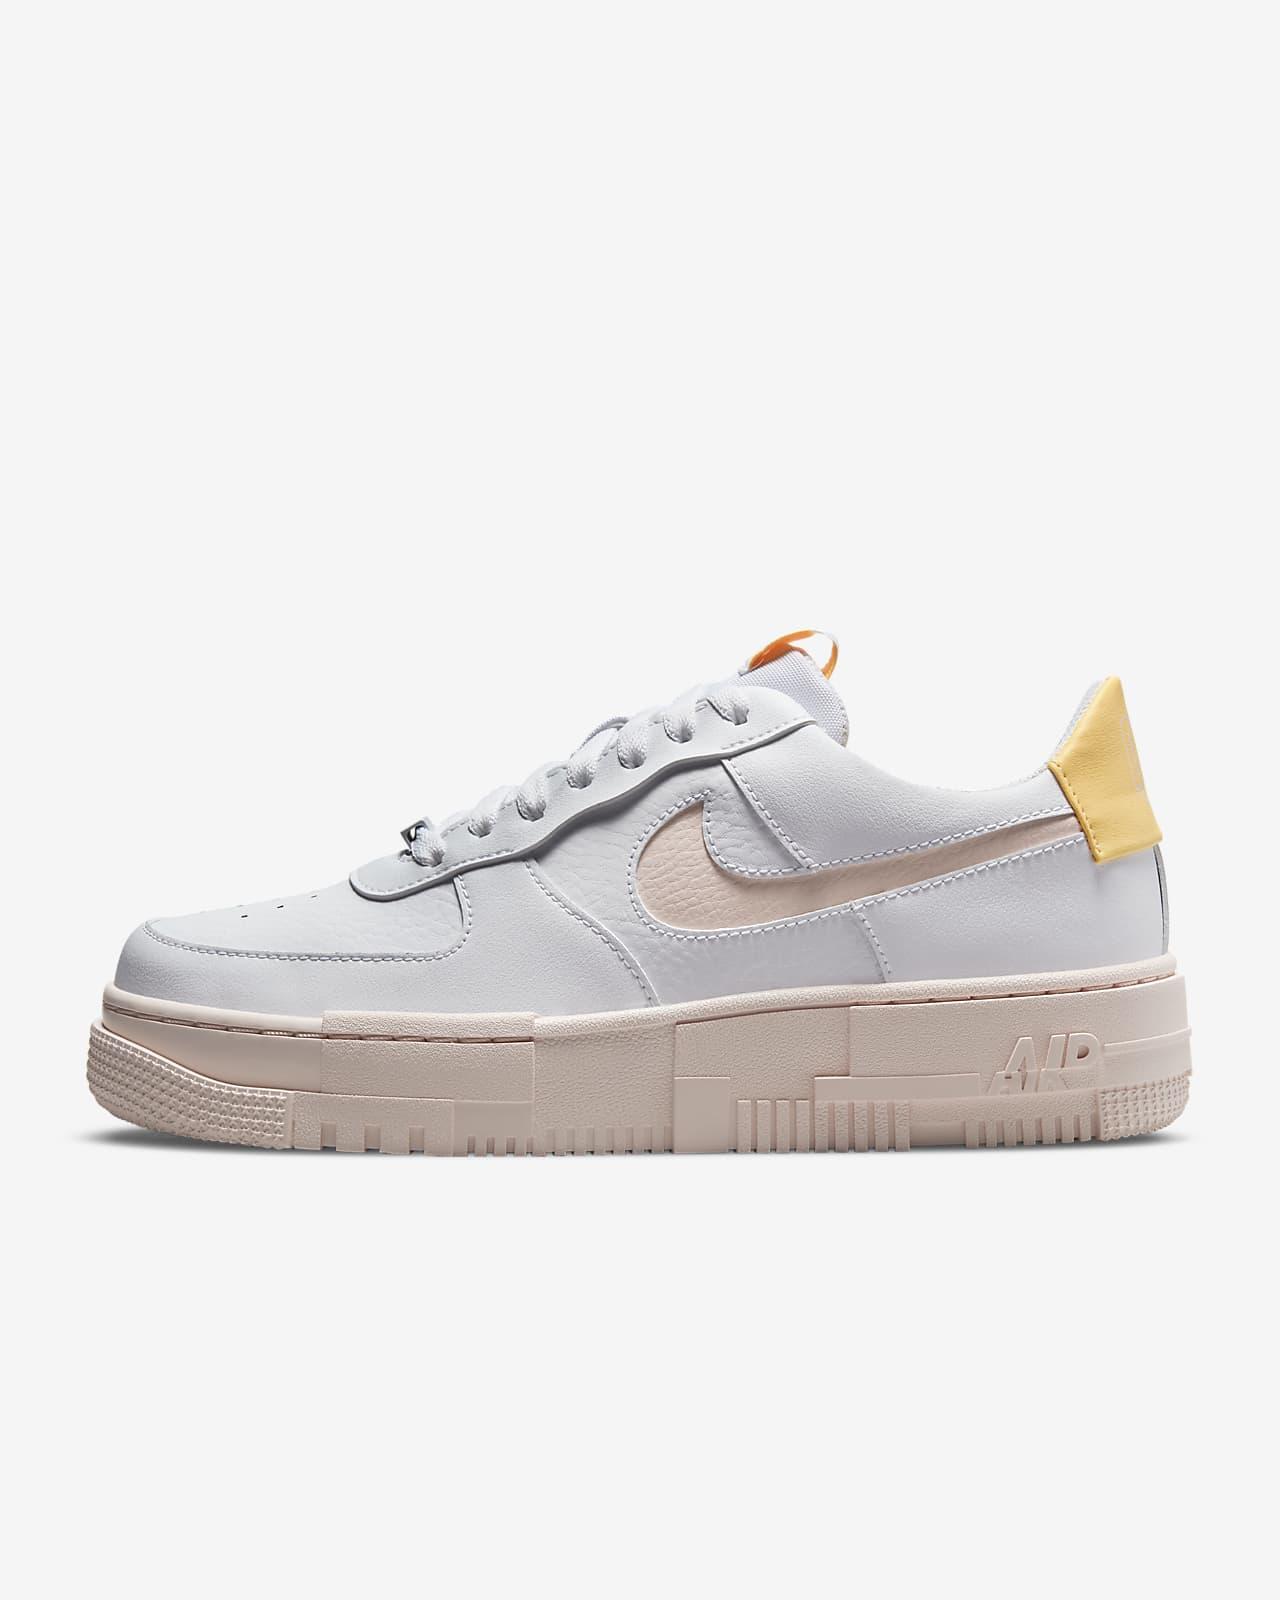 Chaussure Nike AF1 Pixel pour Femme